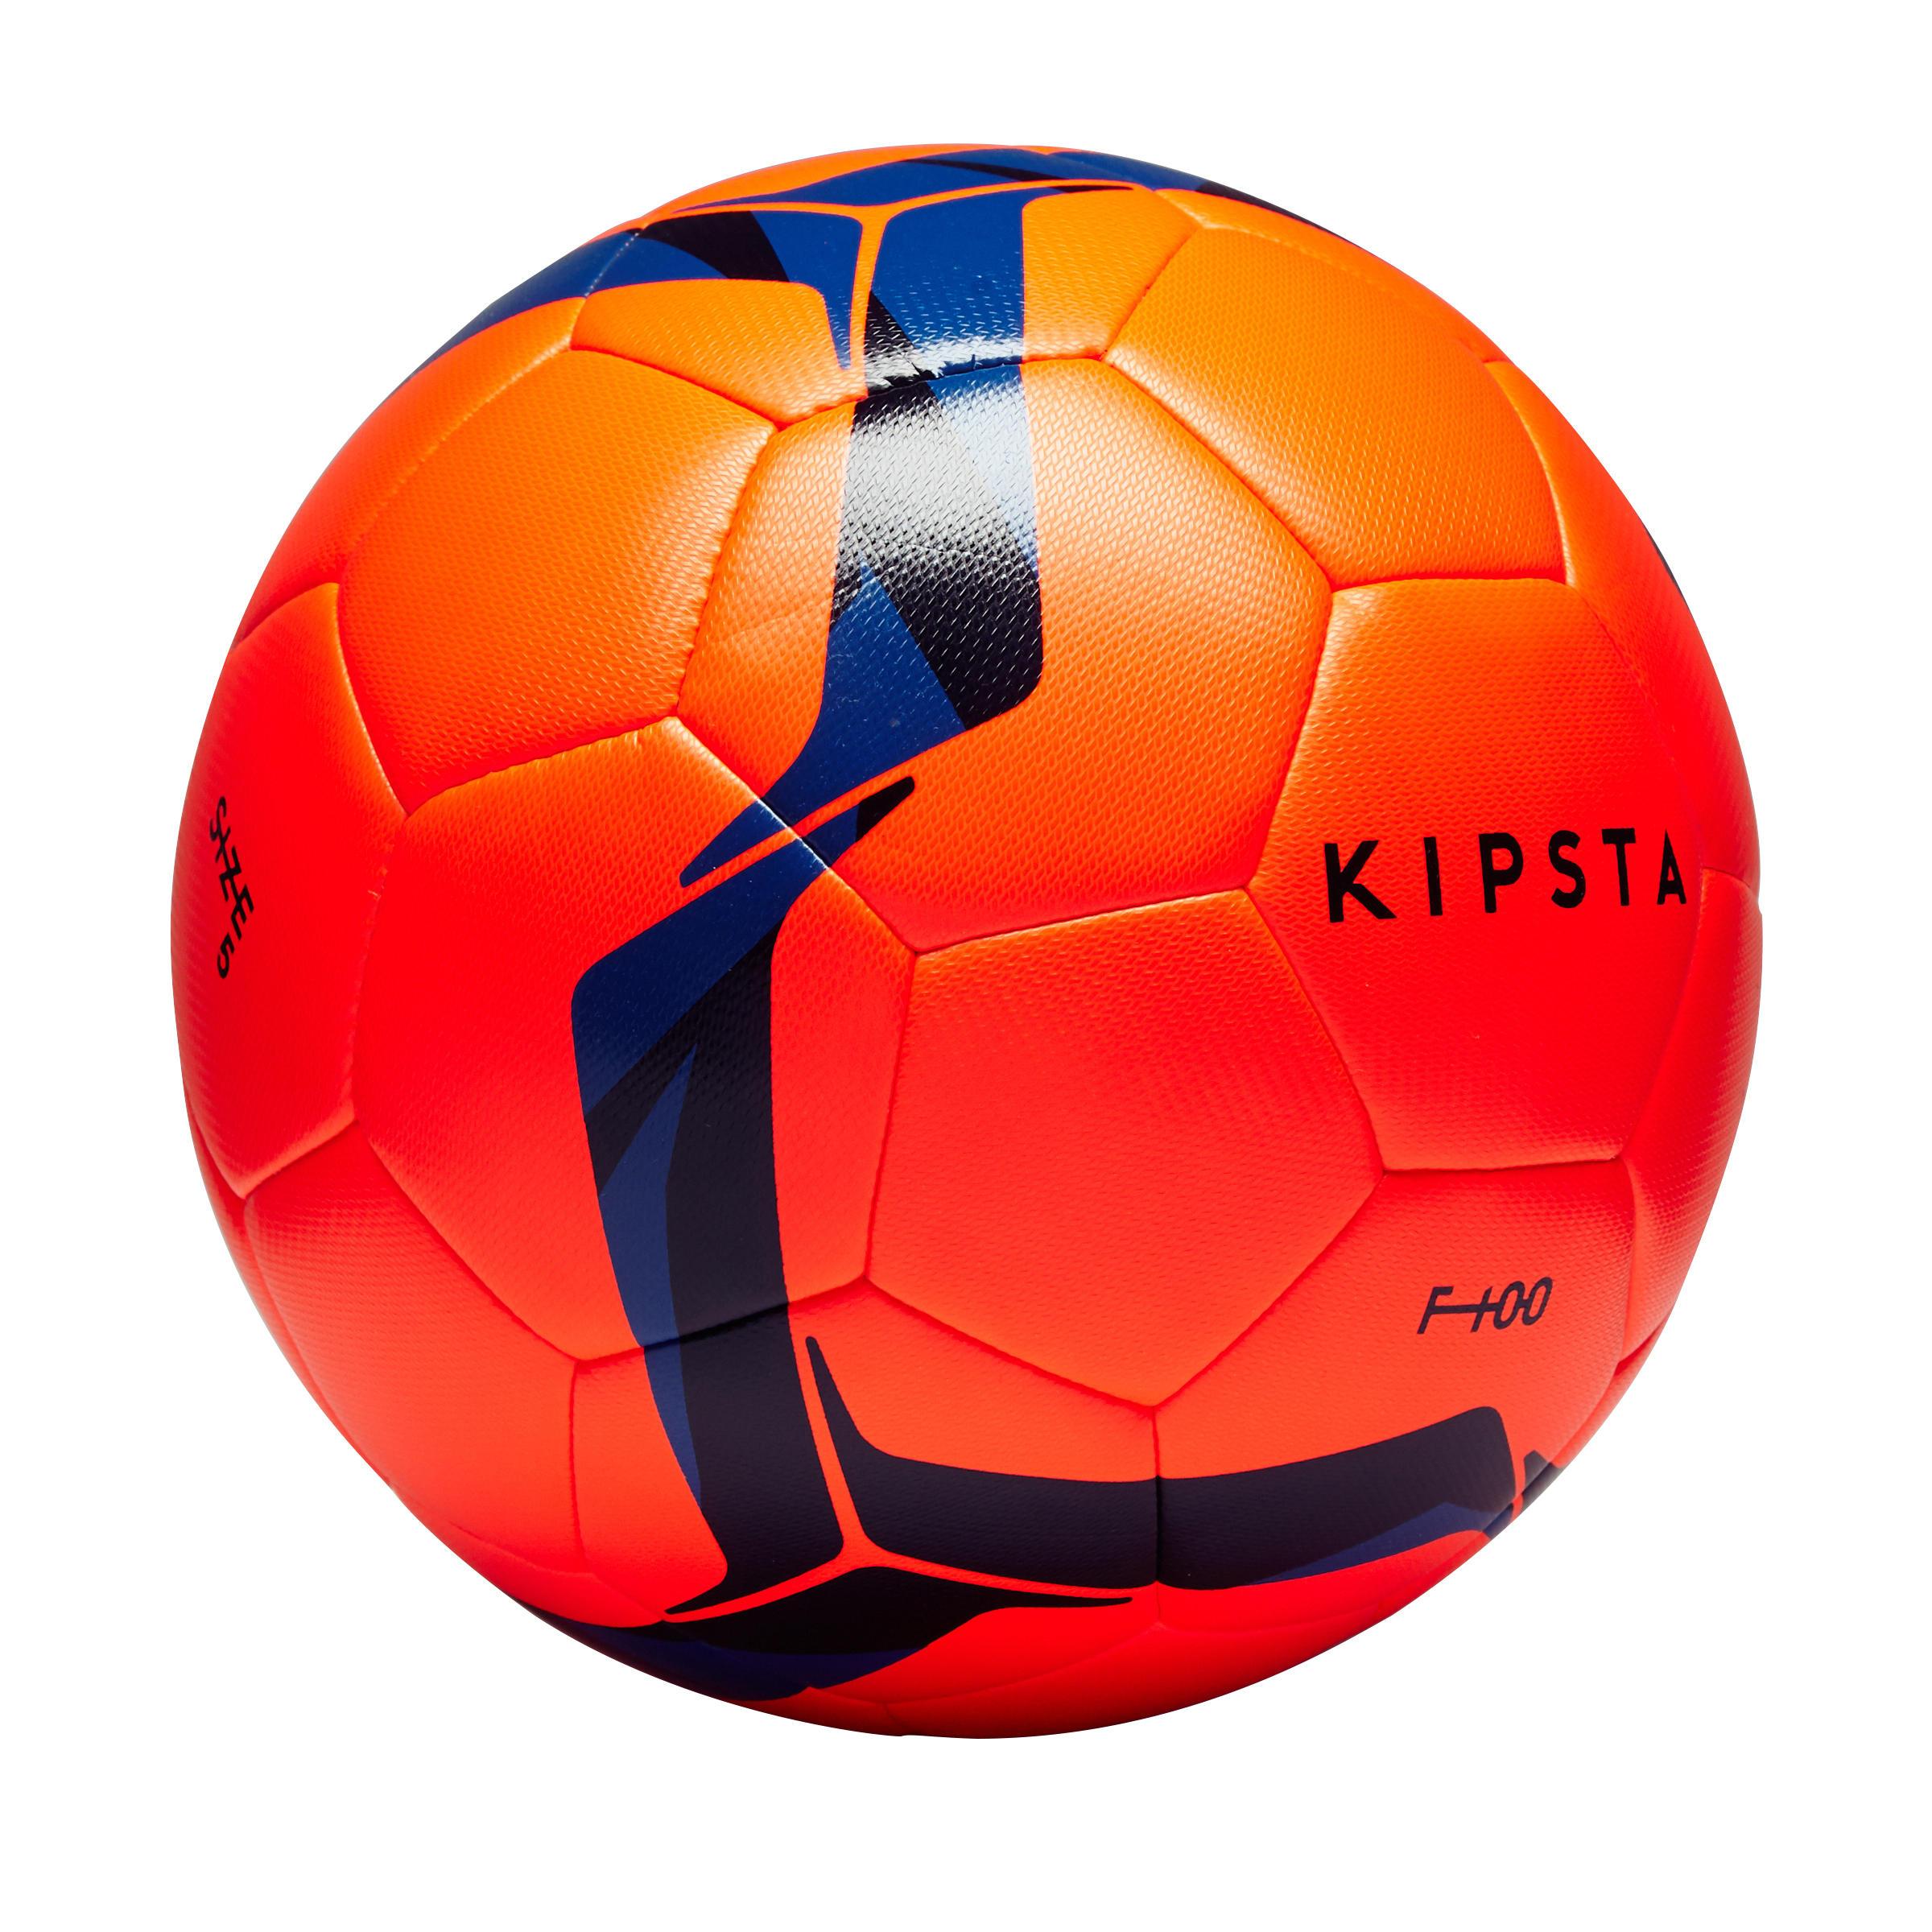 957f93862d0 Voetbal kopen online ← DECATHLON   Nergens goedkoper!